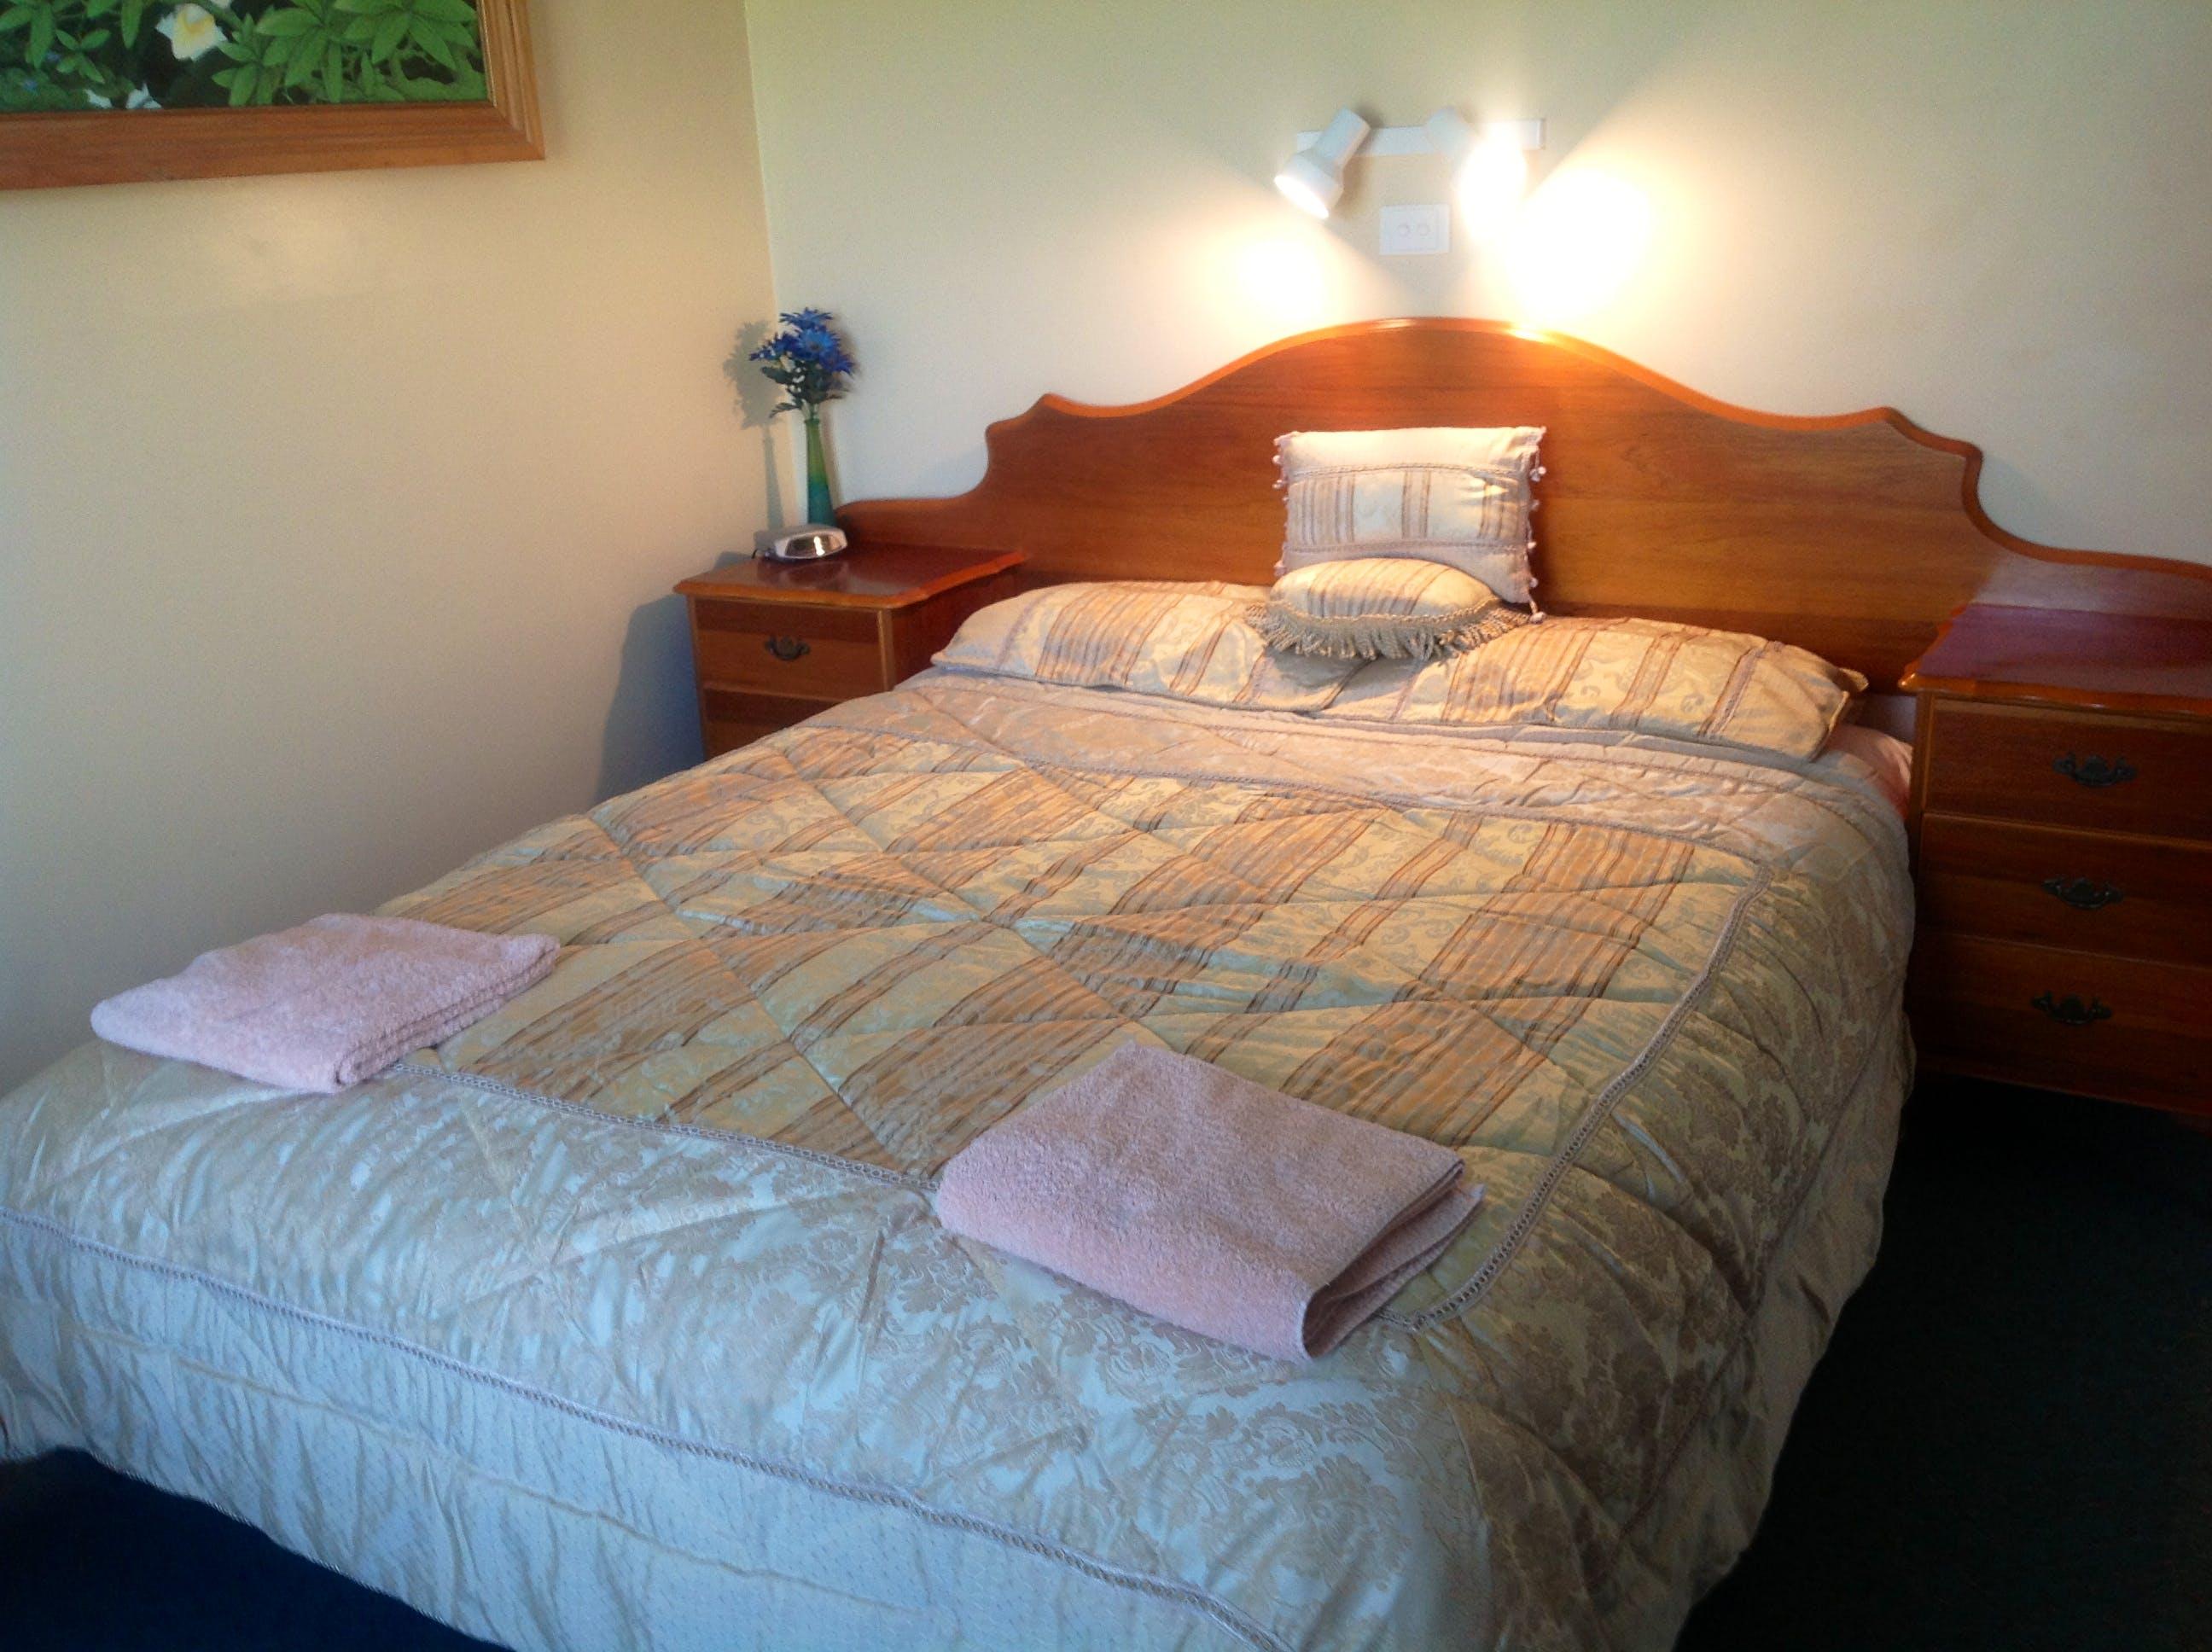 Aaa Granary Accommodation The Last Resort 2 Bedroom Cottage Gumnut Aaa Granary Accommodation The Last